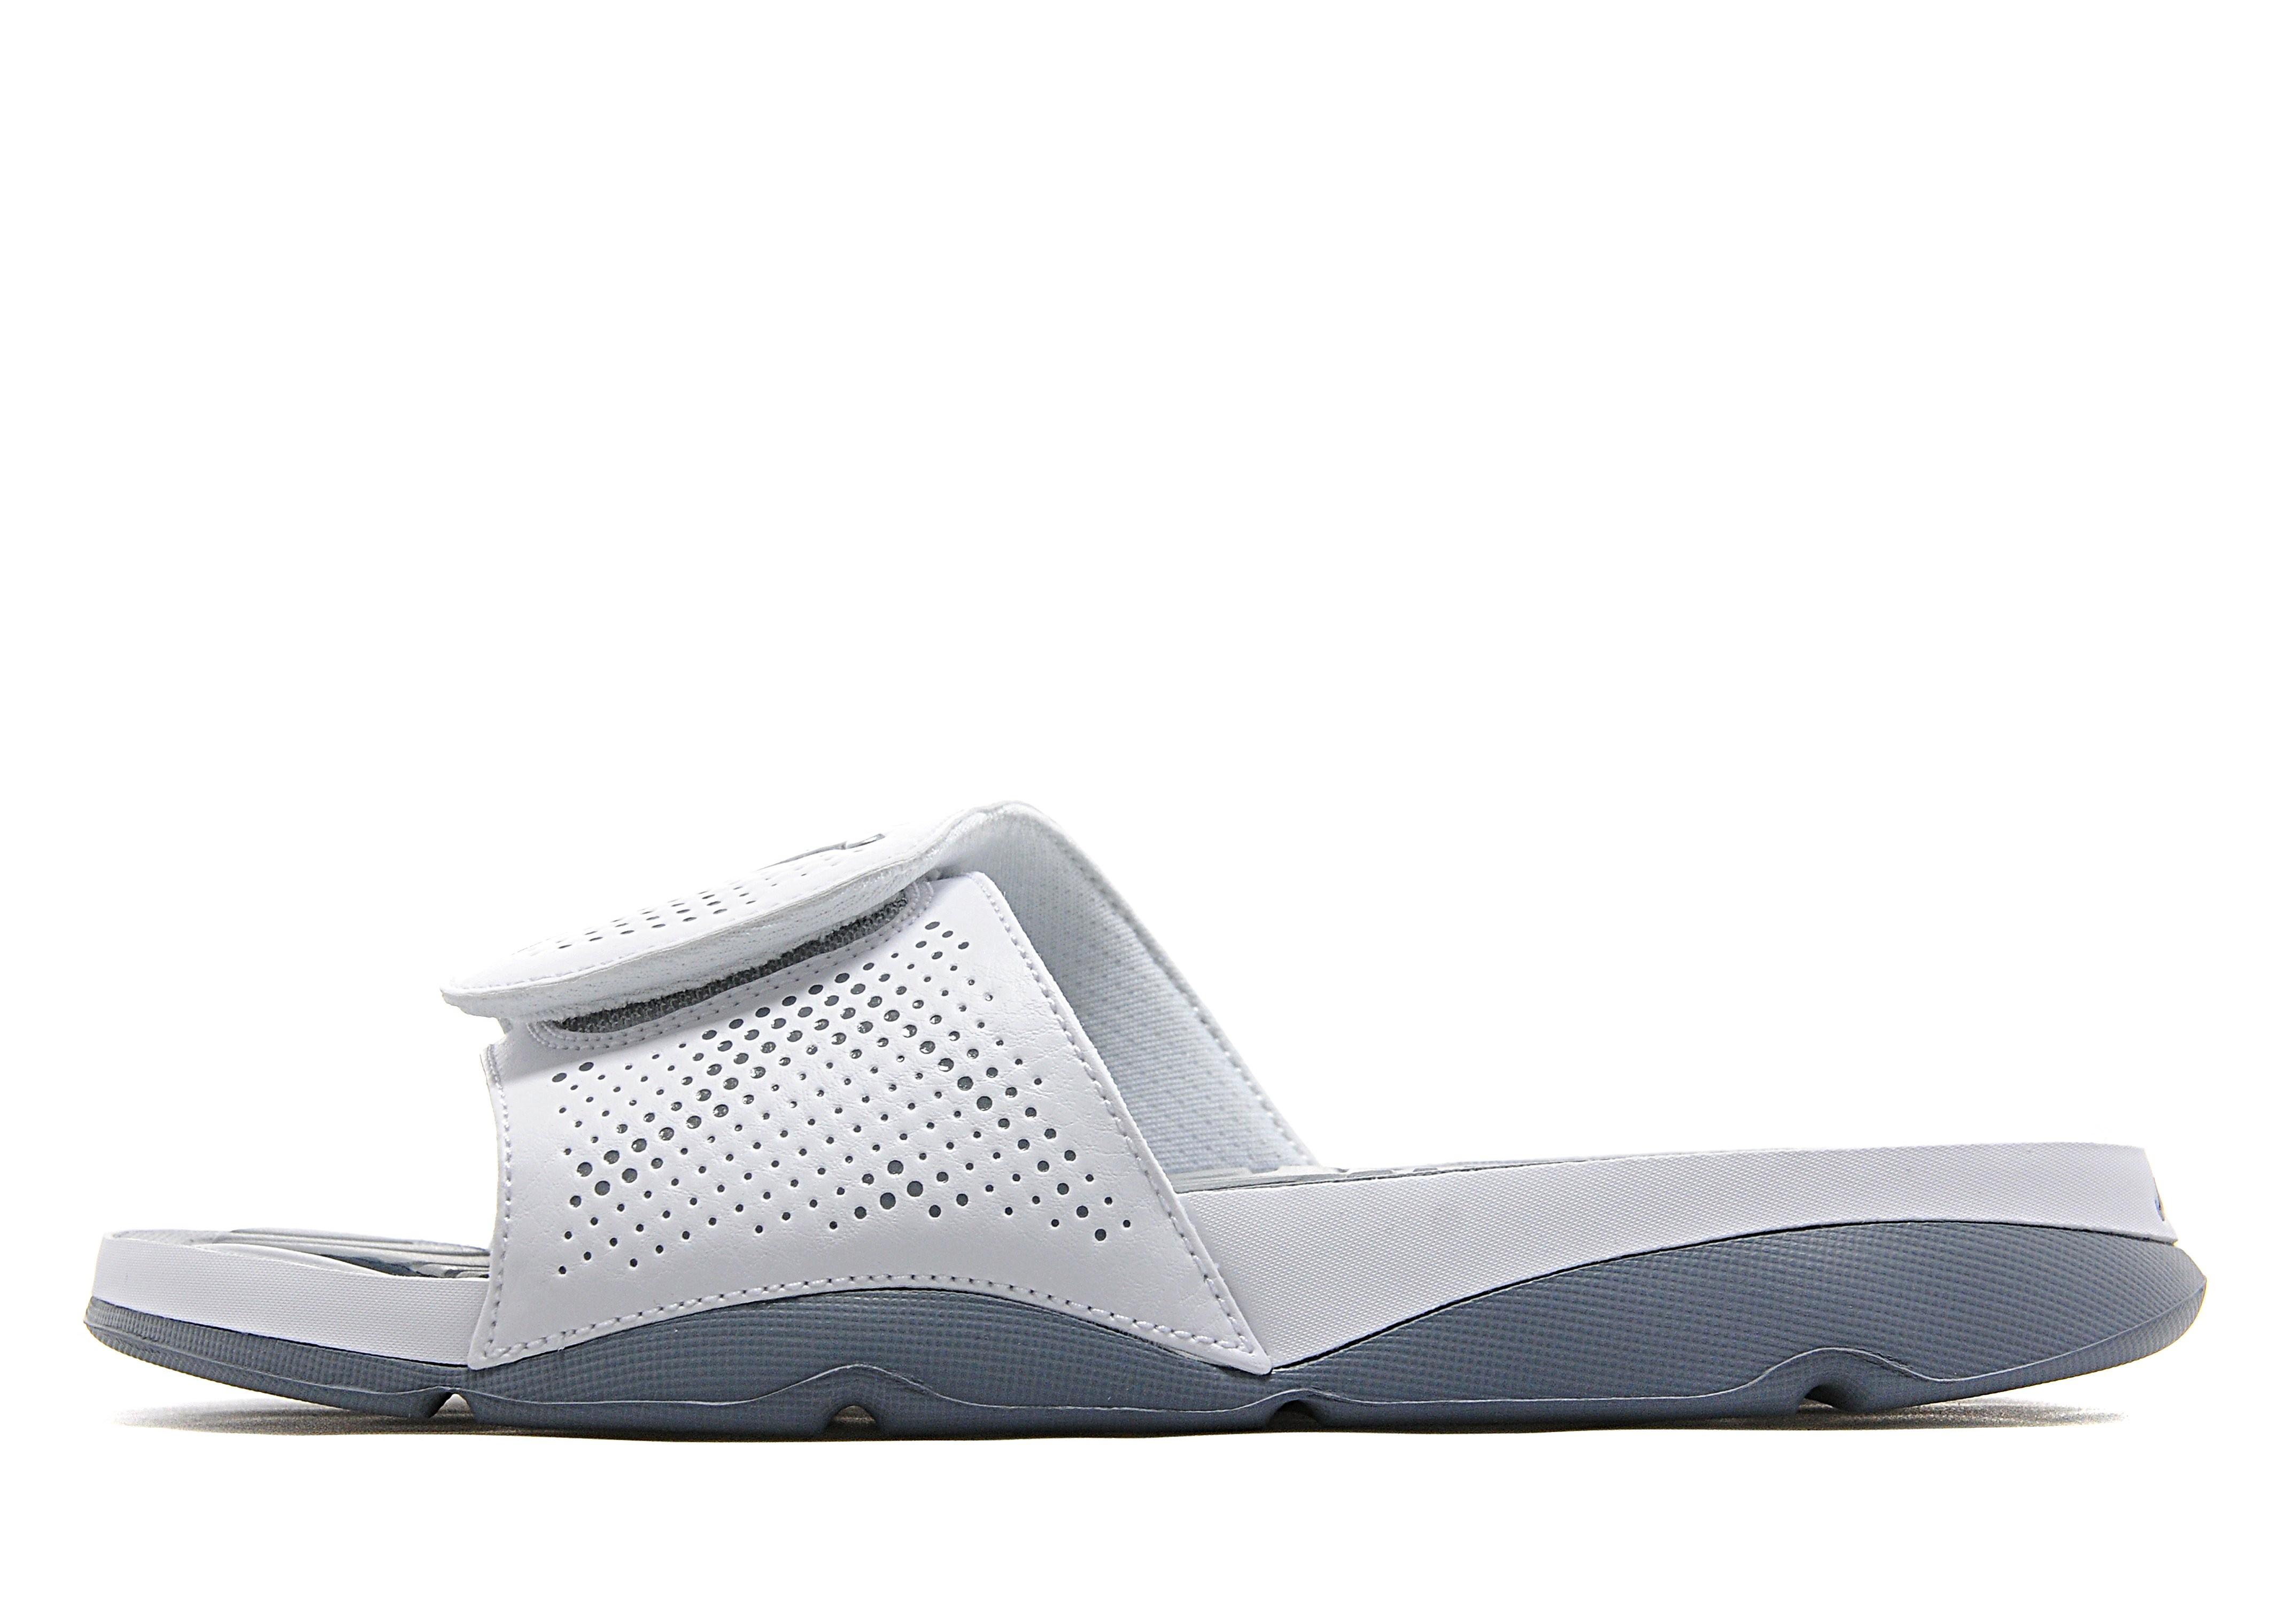 Jordan Hydro 5 Slides